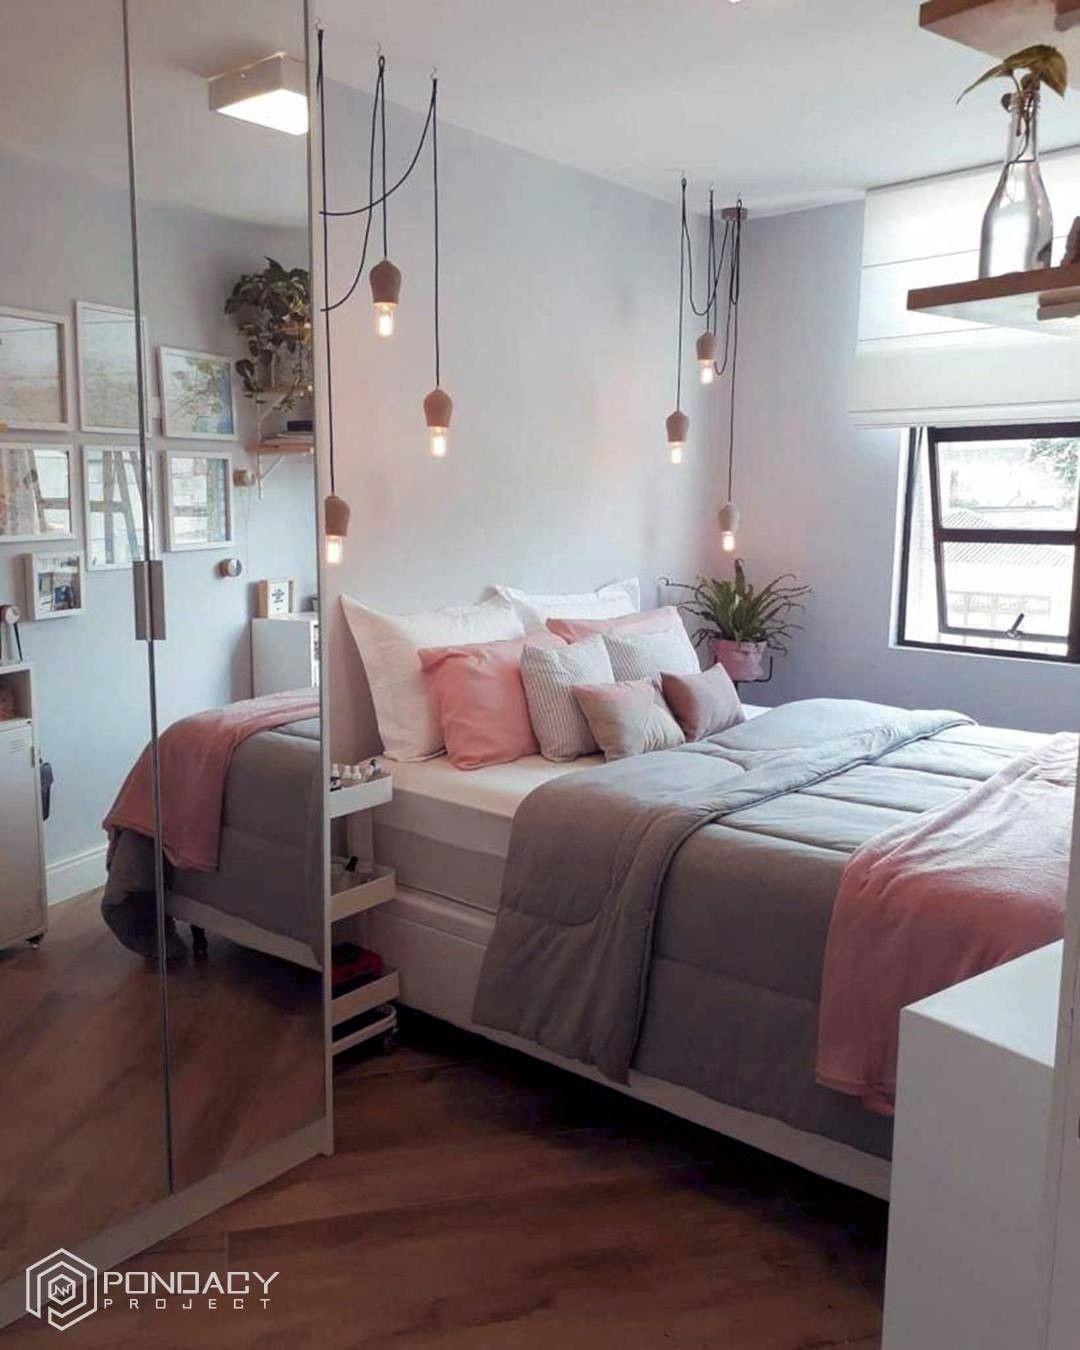 Kamar tidur minimalis 3x3 2